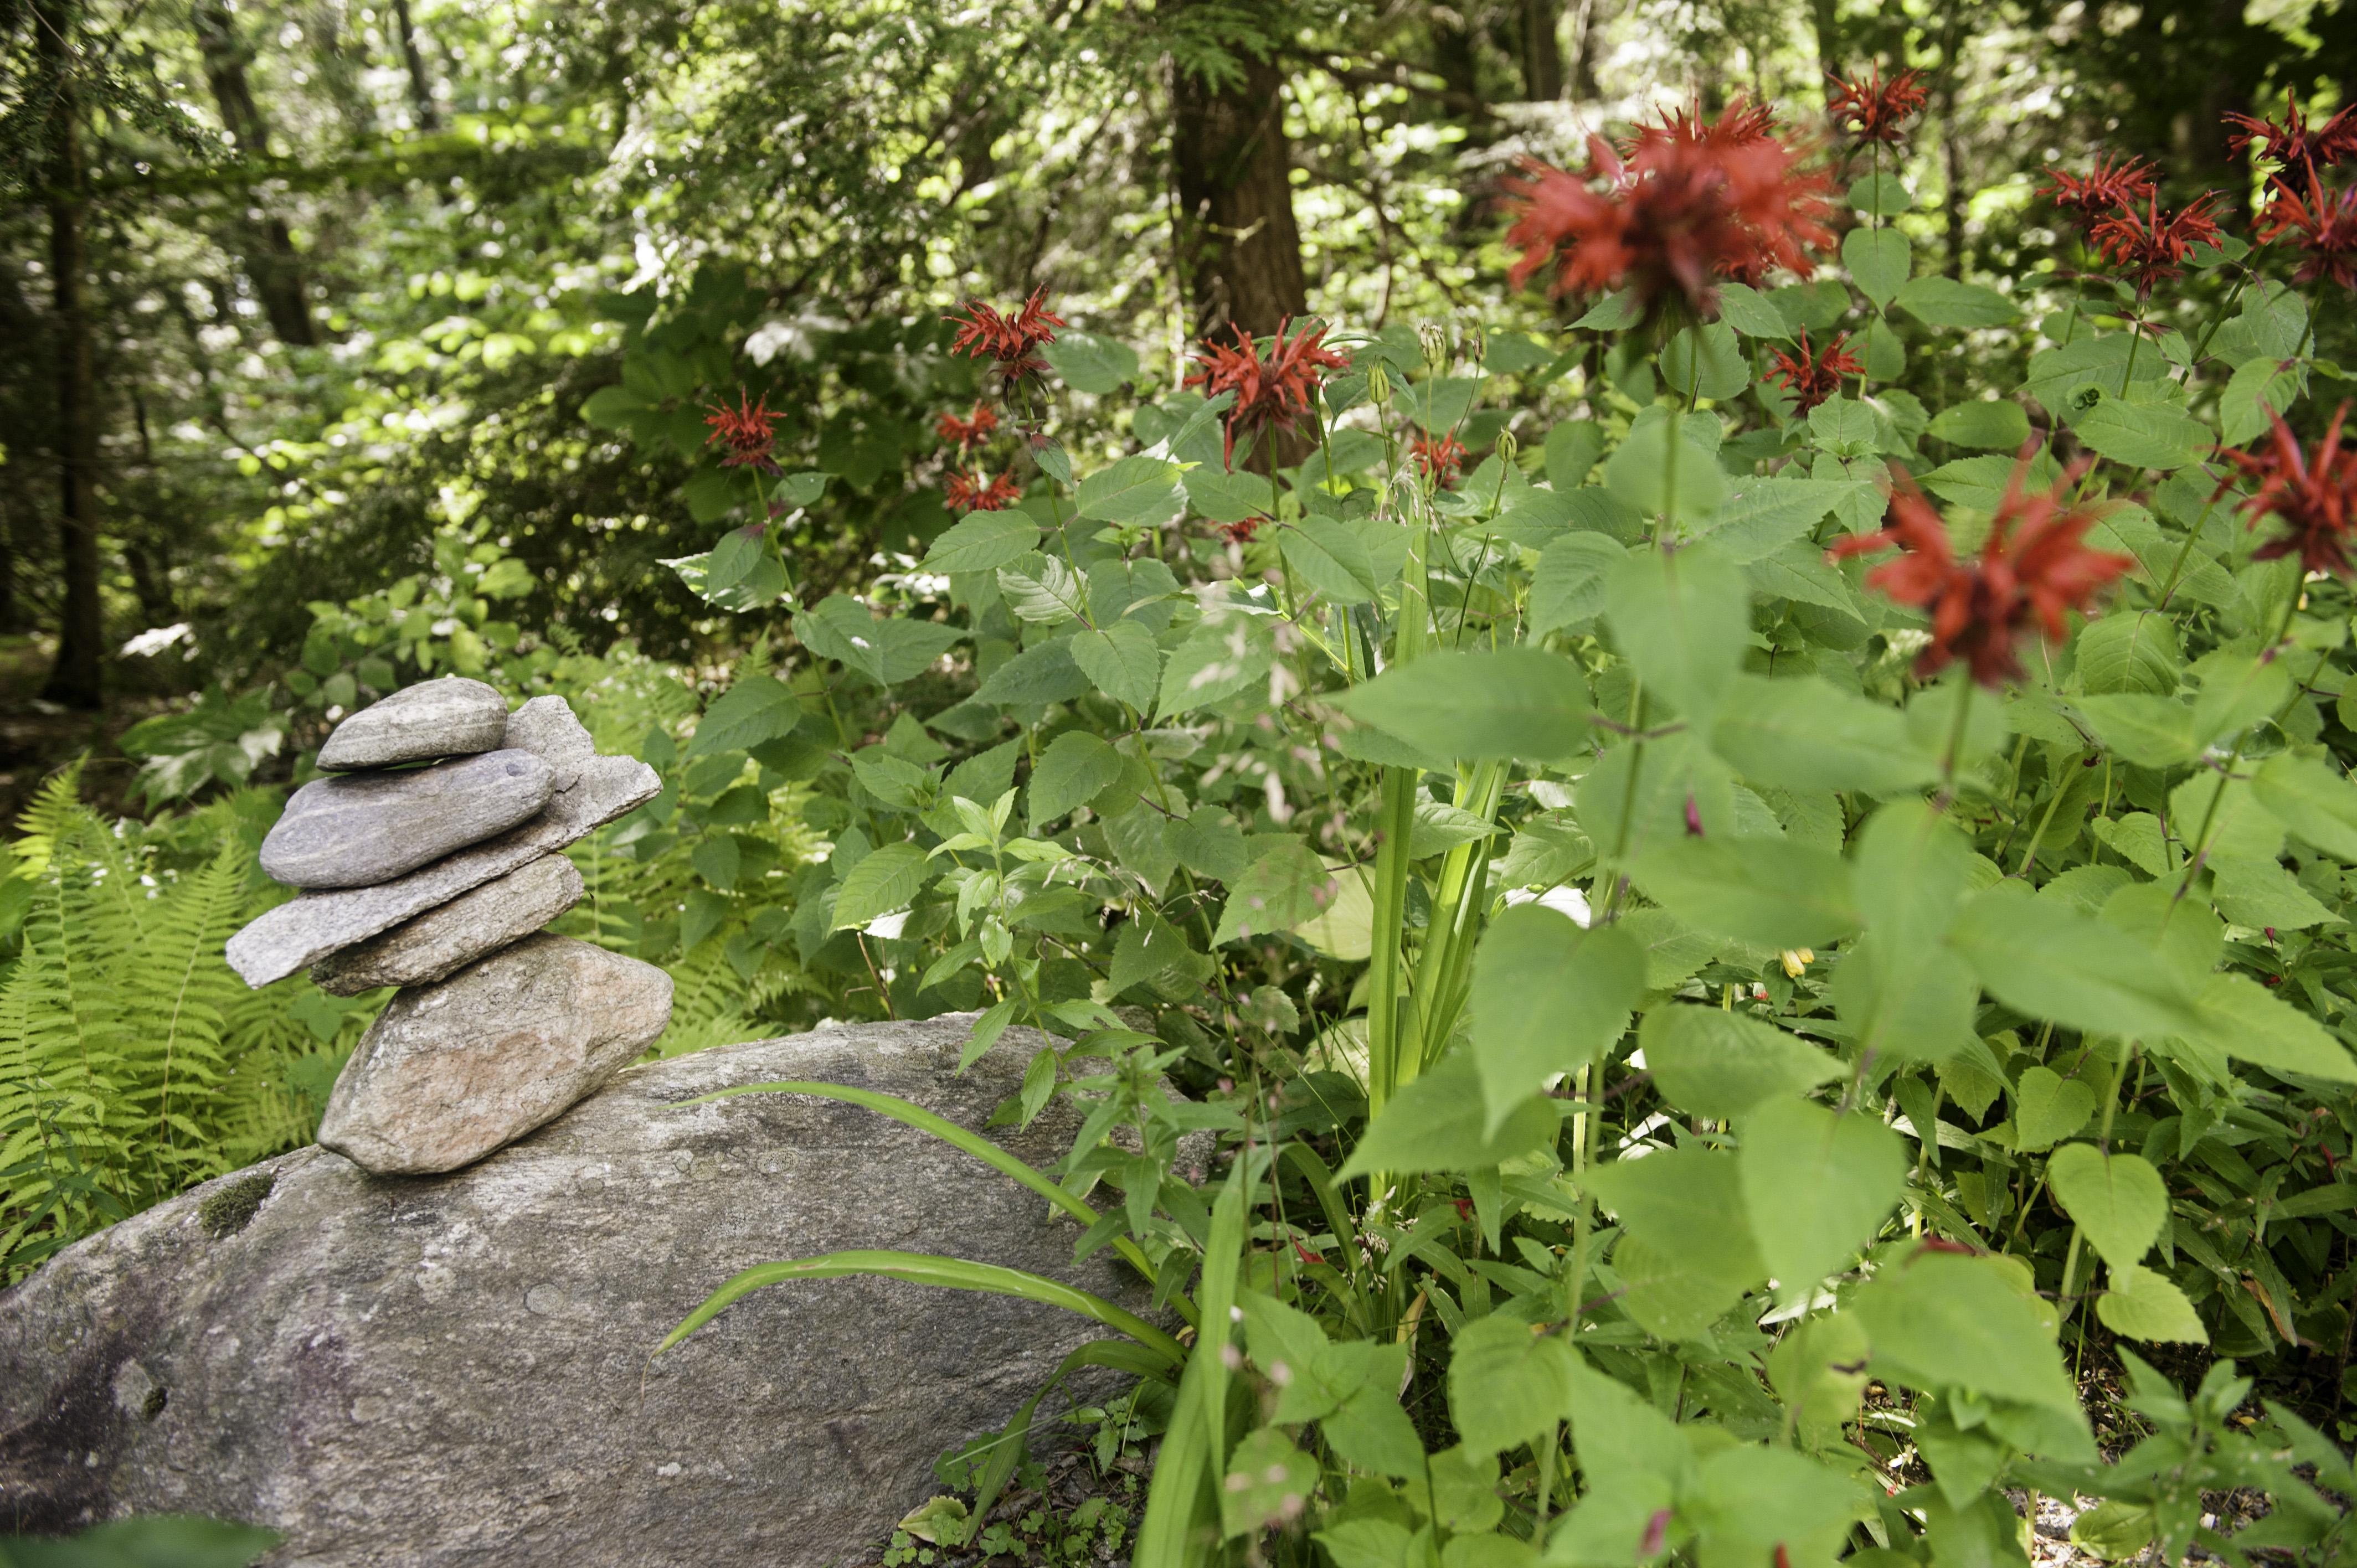 Rock sculpture, organic lifestyle retreat